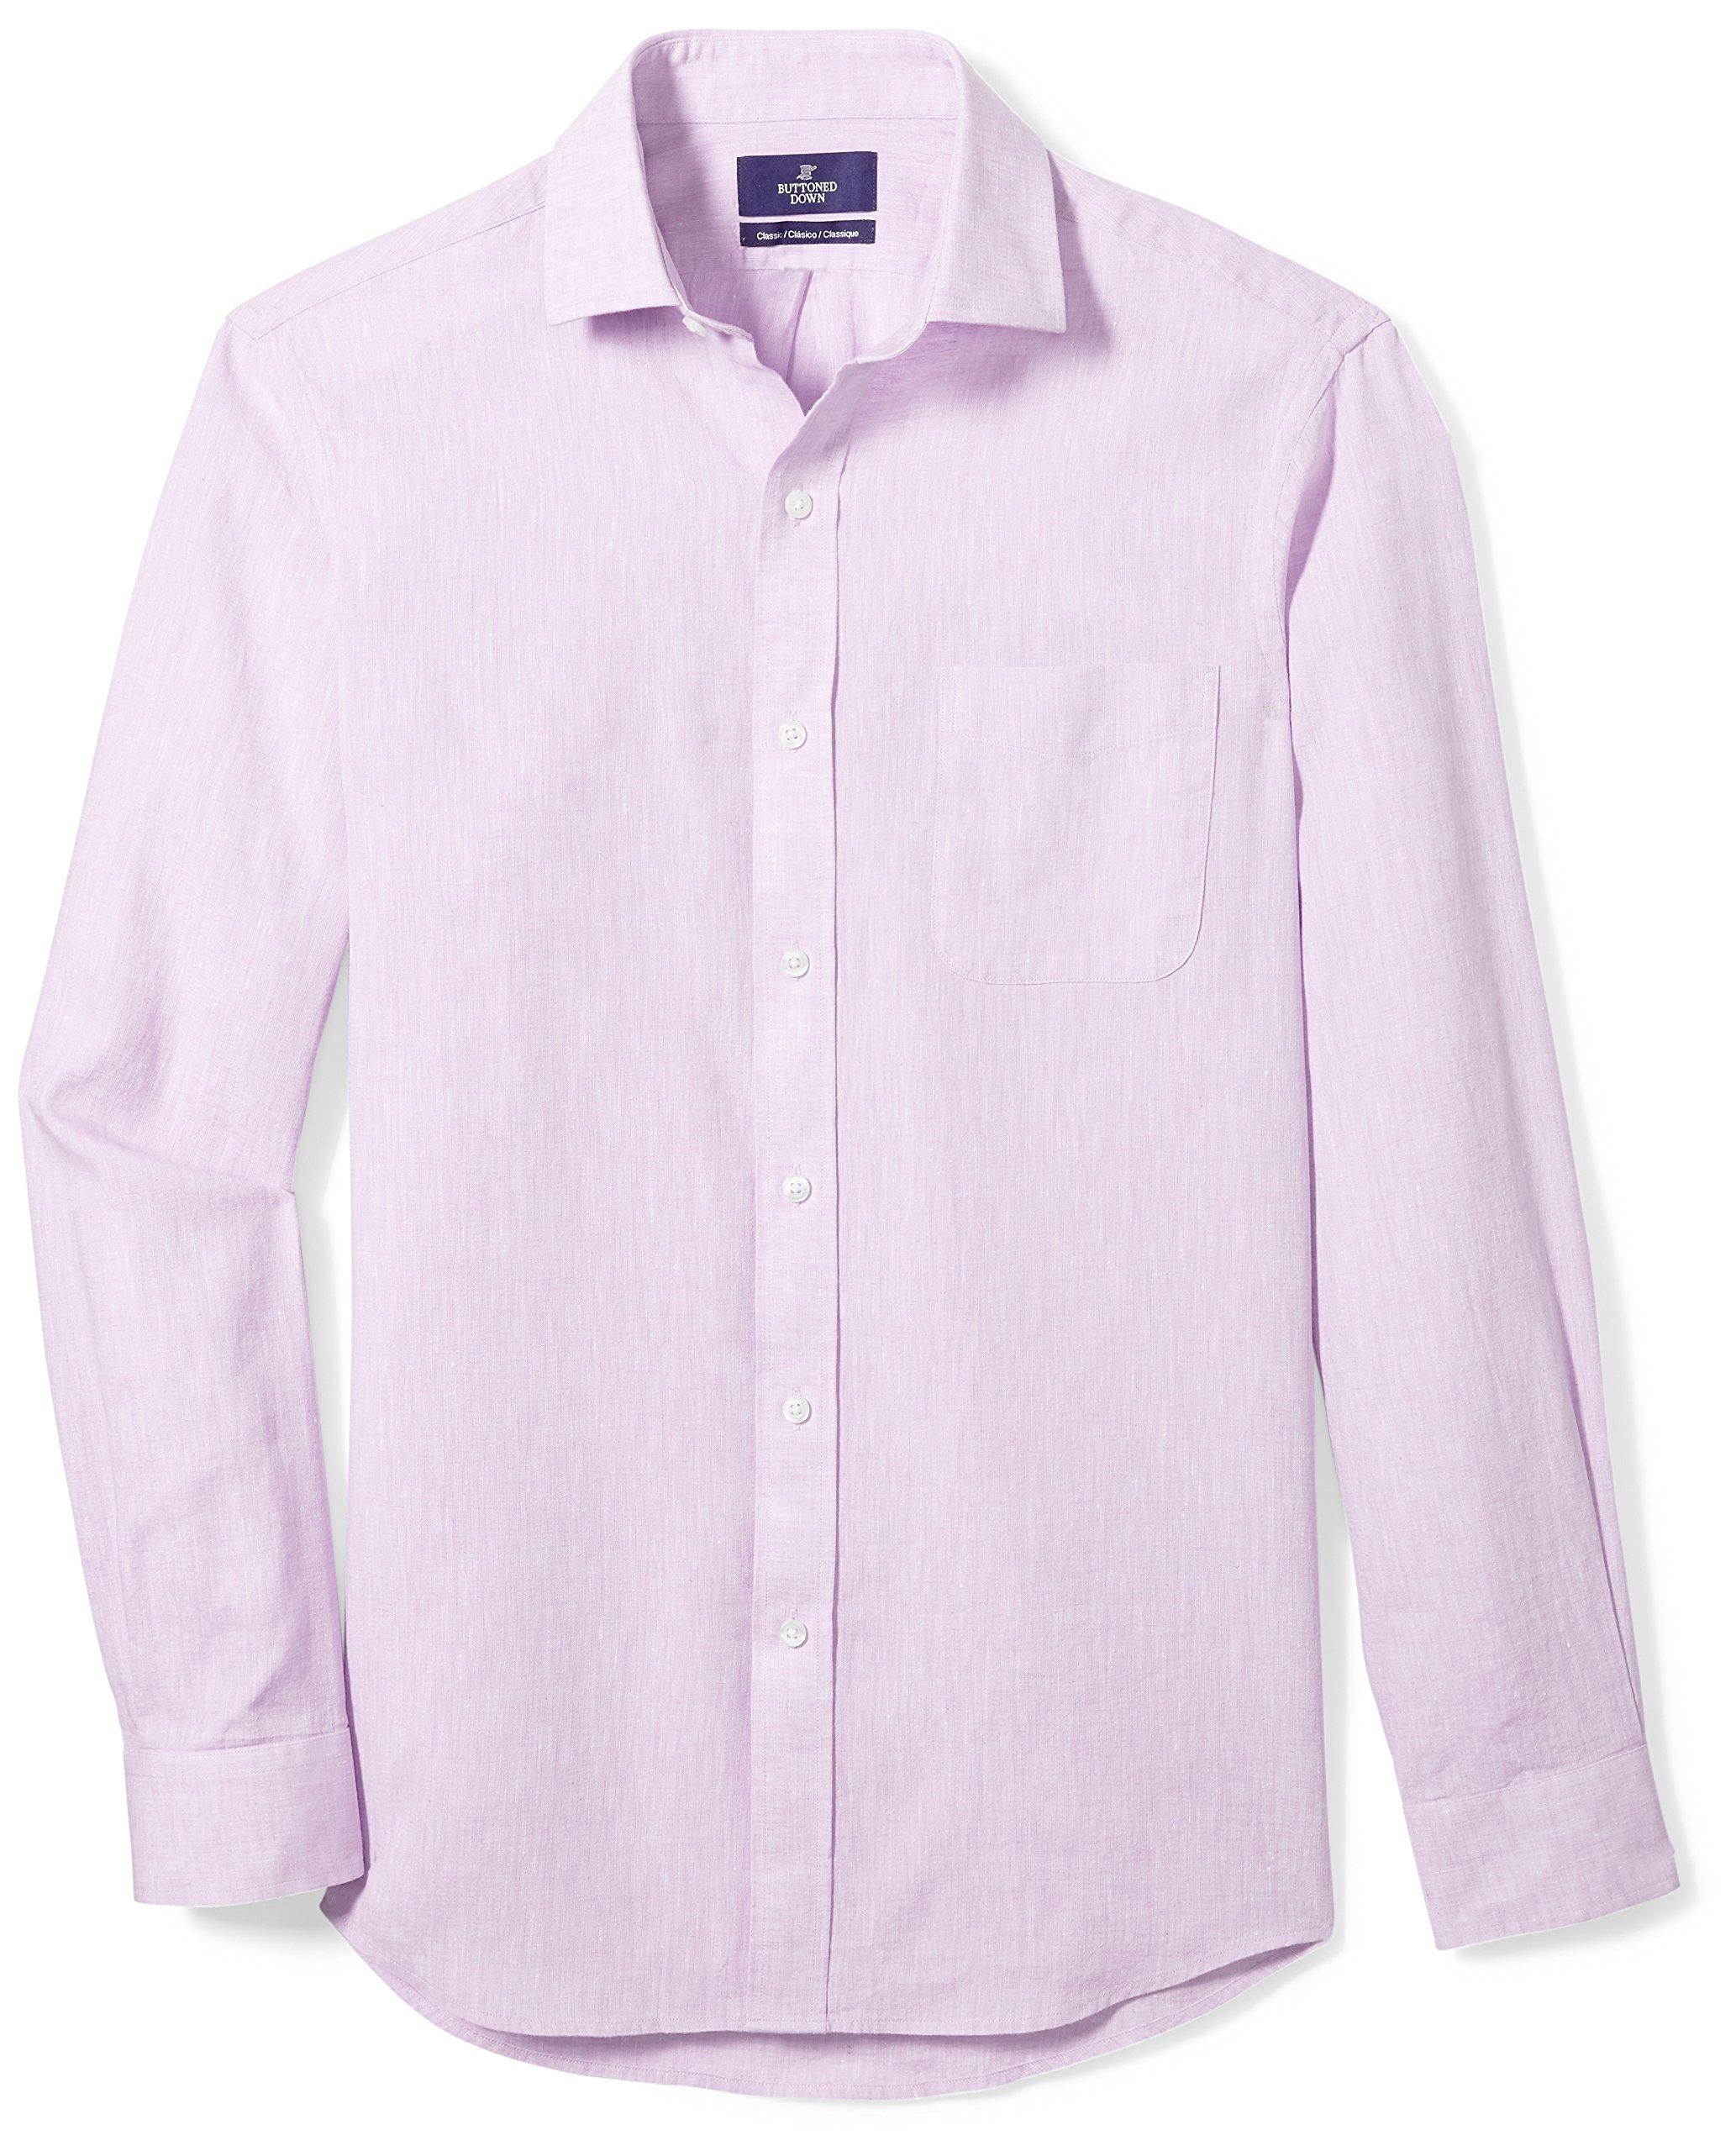 Buttoned Down Men's Classic Fit Spread-Collar Linen Sport Shirt, Purple, 15-15.5'' Neck 32-33'' Sleeve